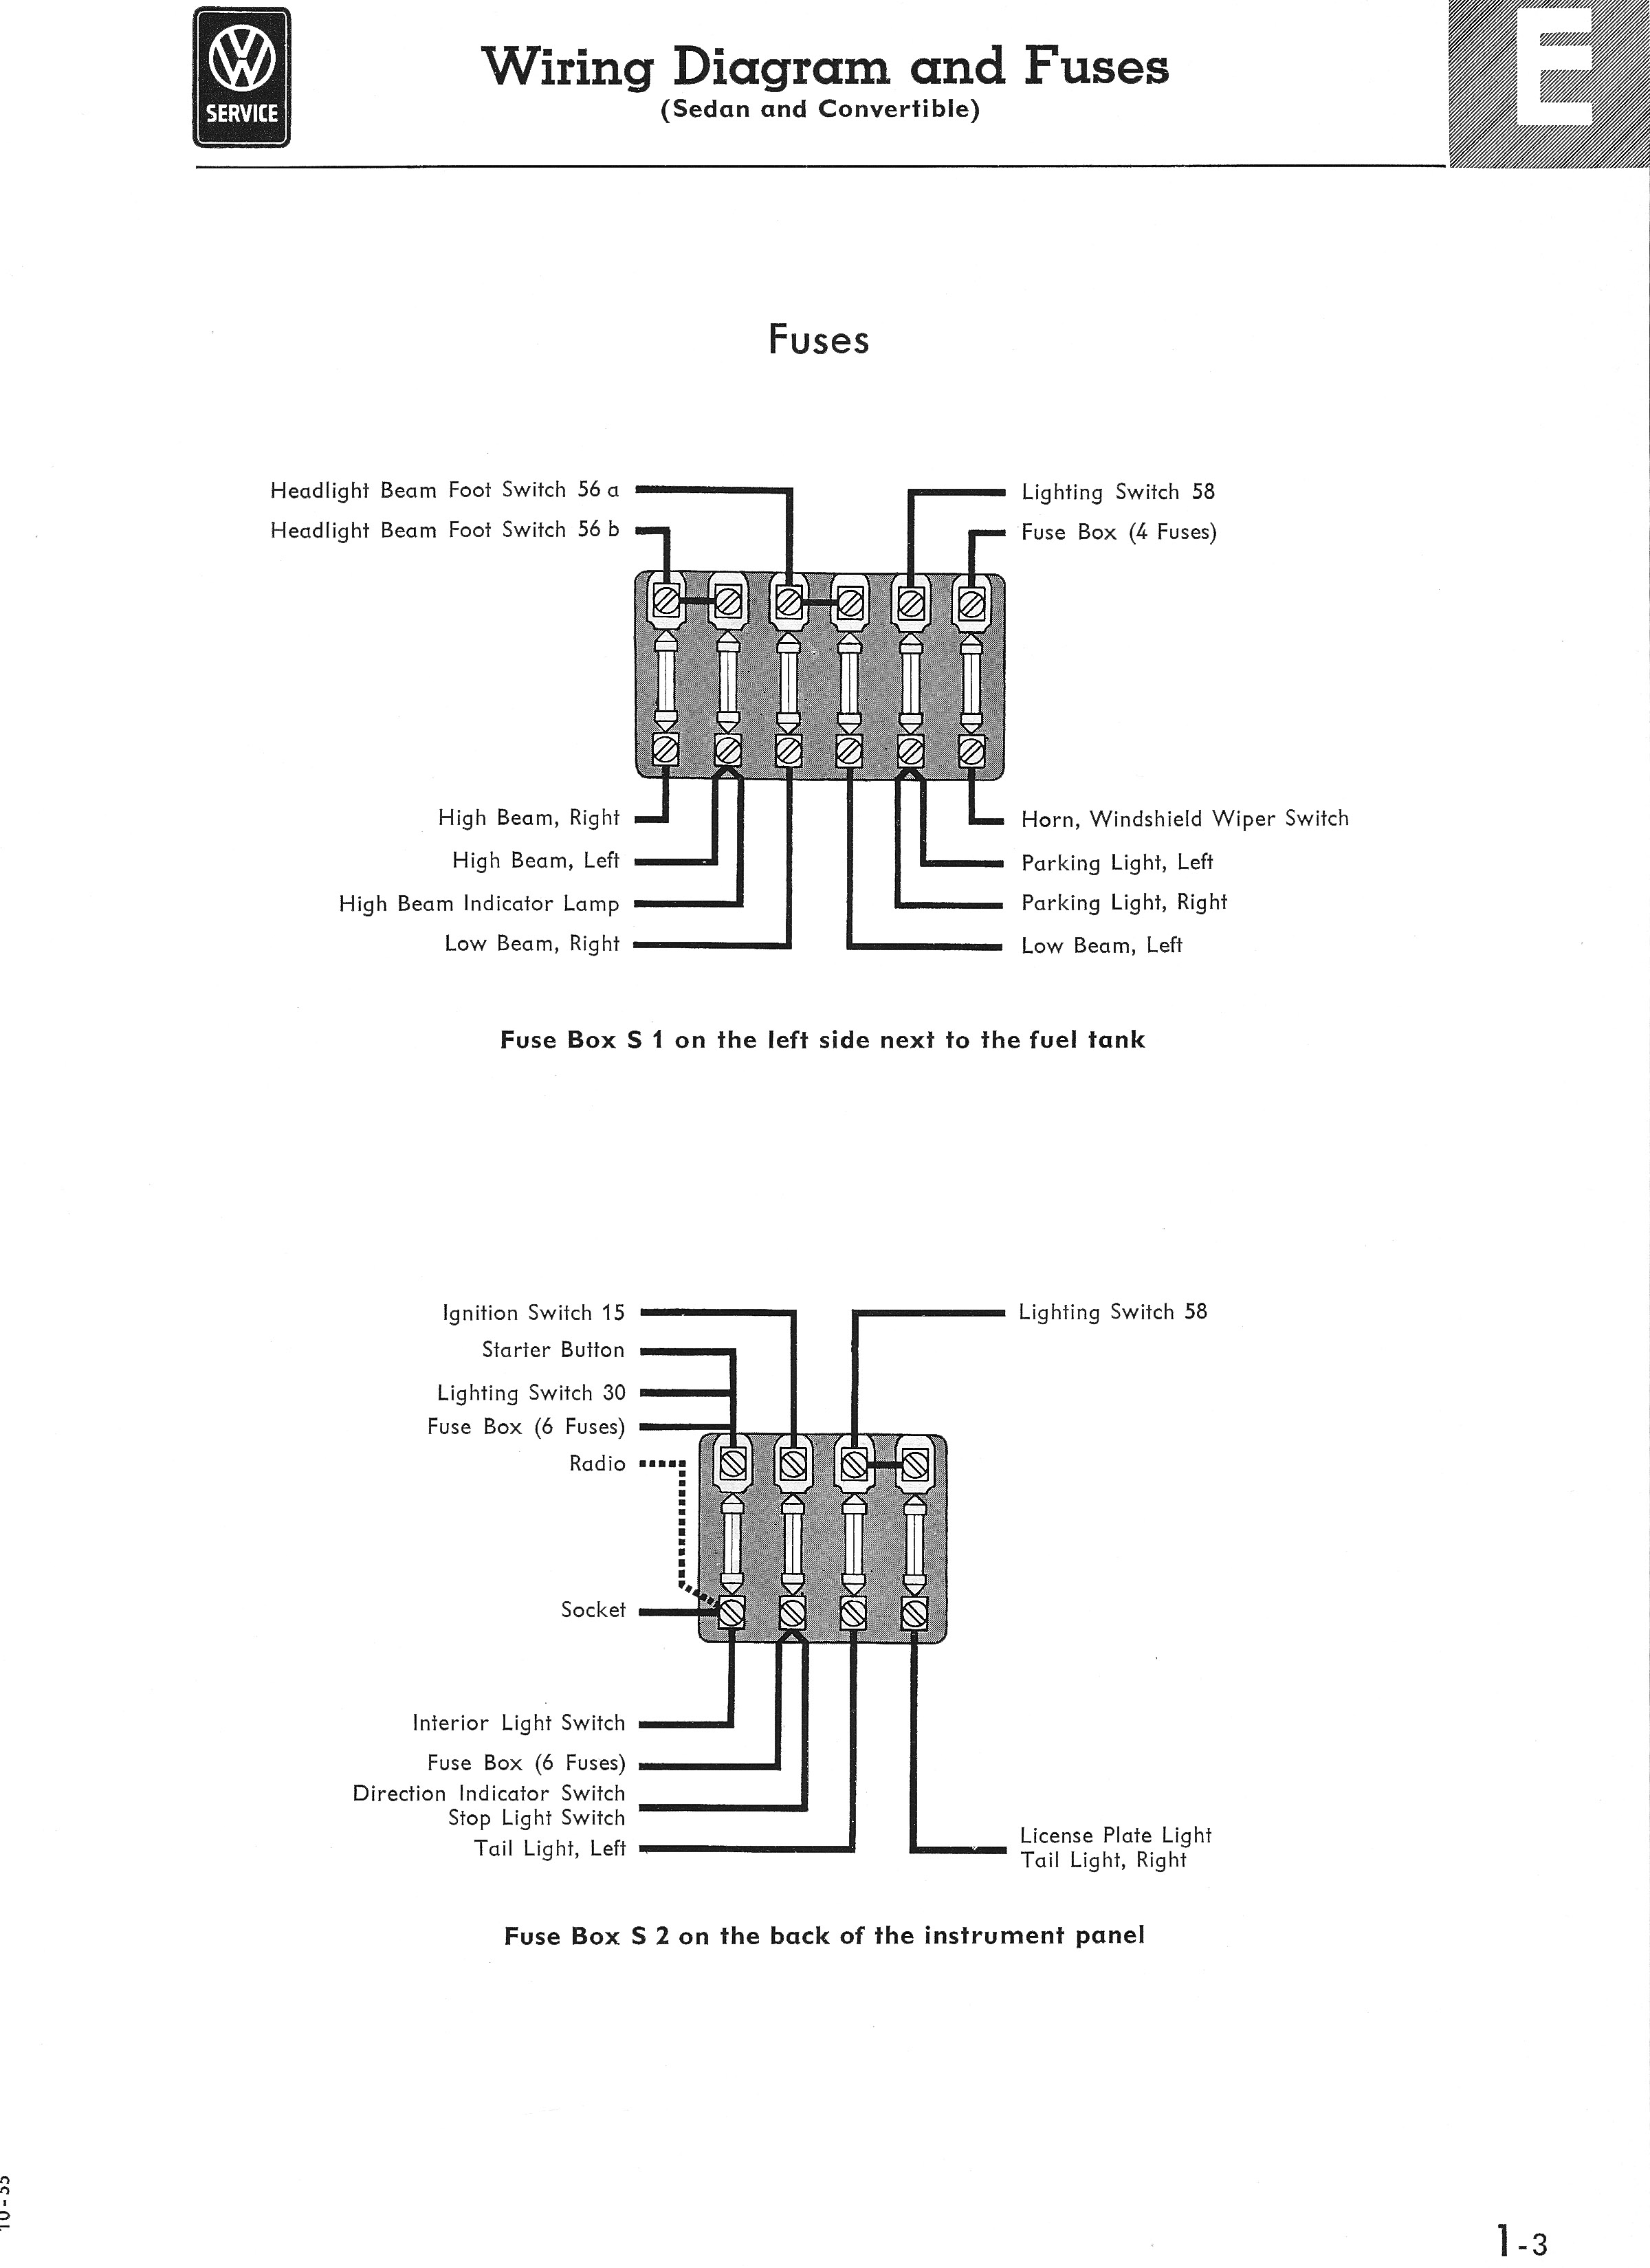 Sew Drn Motor Wiring Diagram 28 Images Eurodrive Bug 5253 Fuses 300dpiresize6652c914 Wa20drs71s4 Diagrams